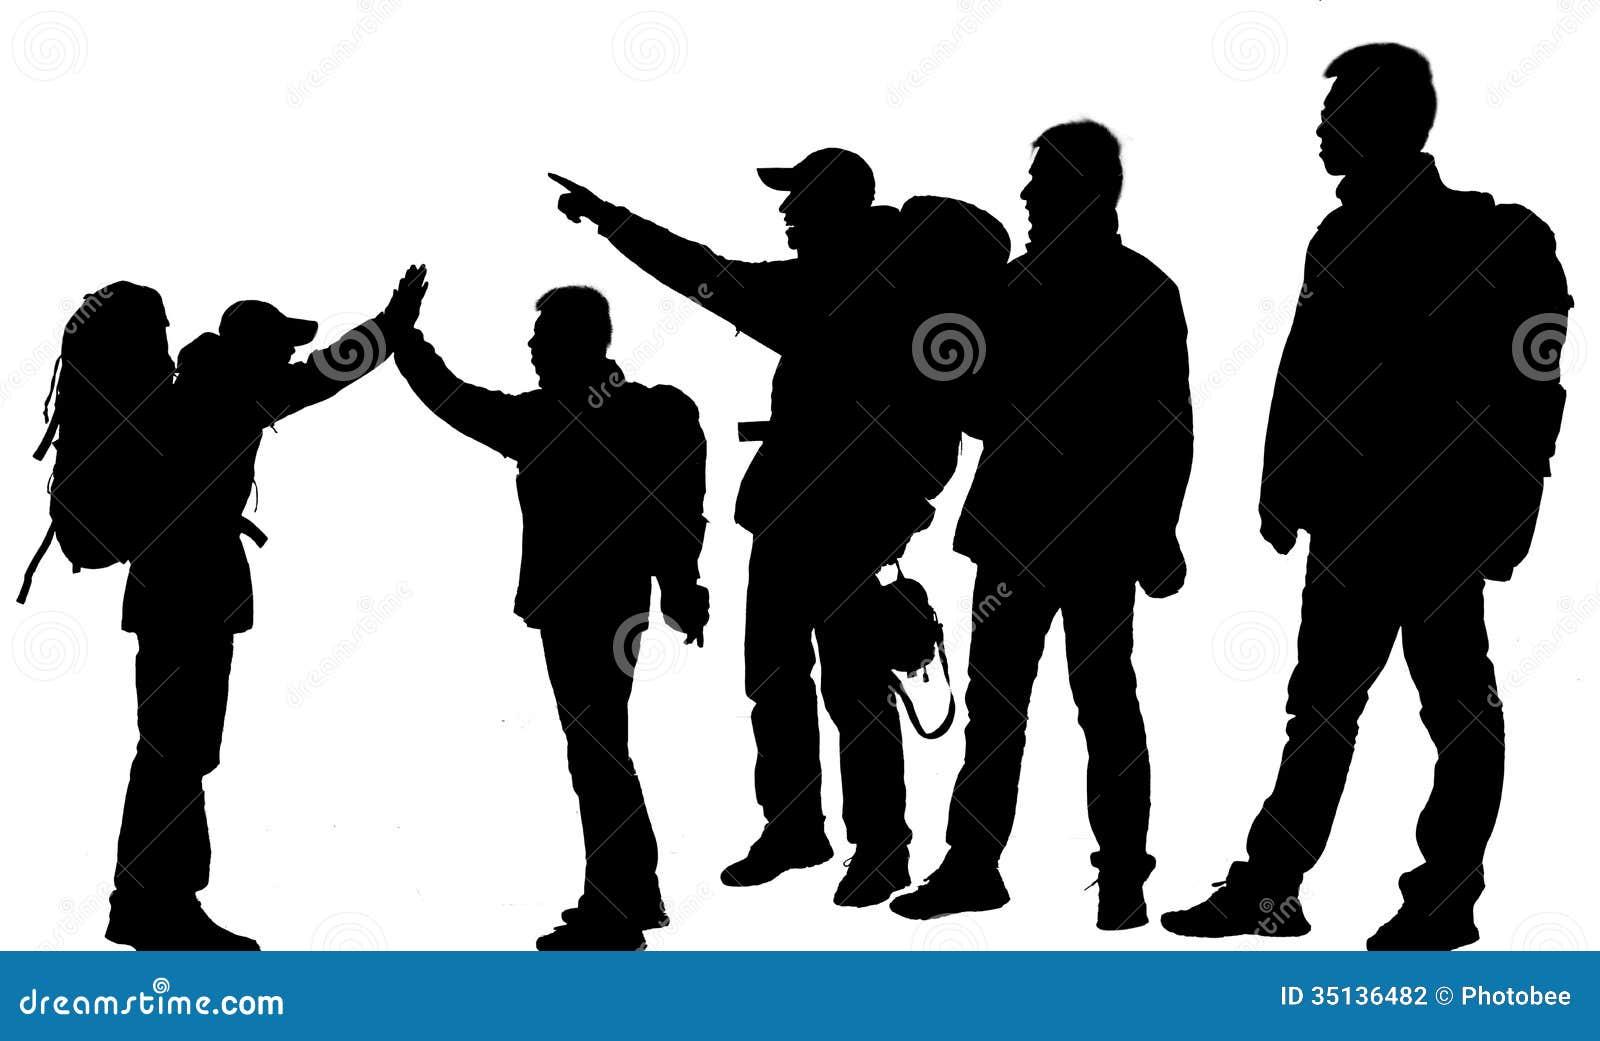 hiking silhouette desktop wallpaper - photo #43